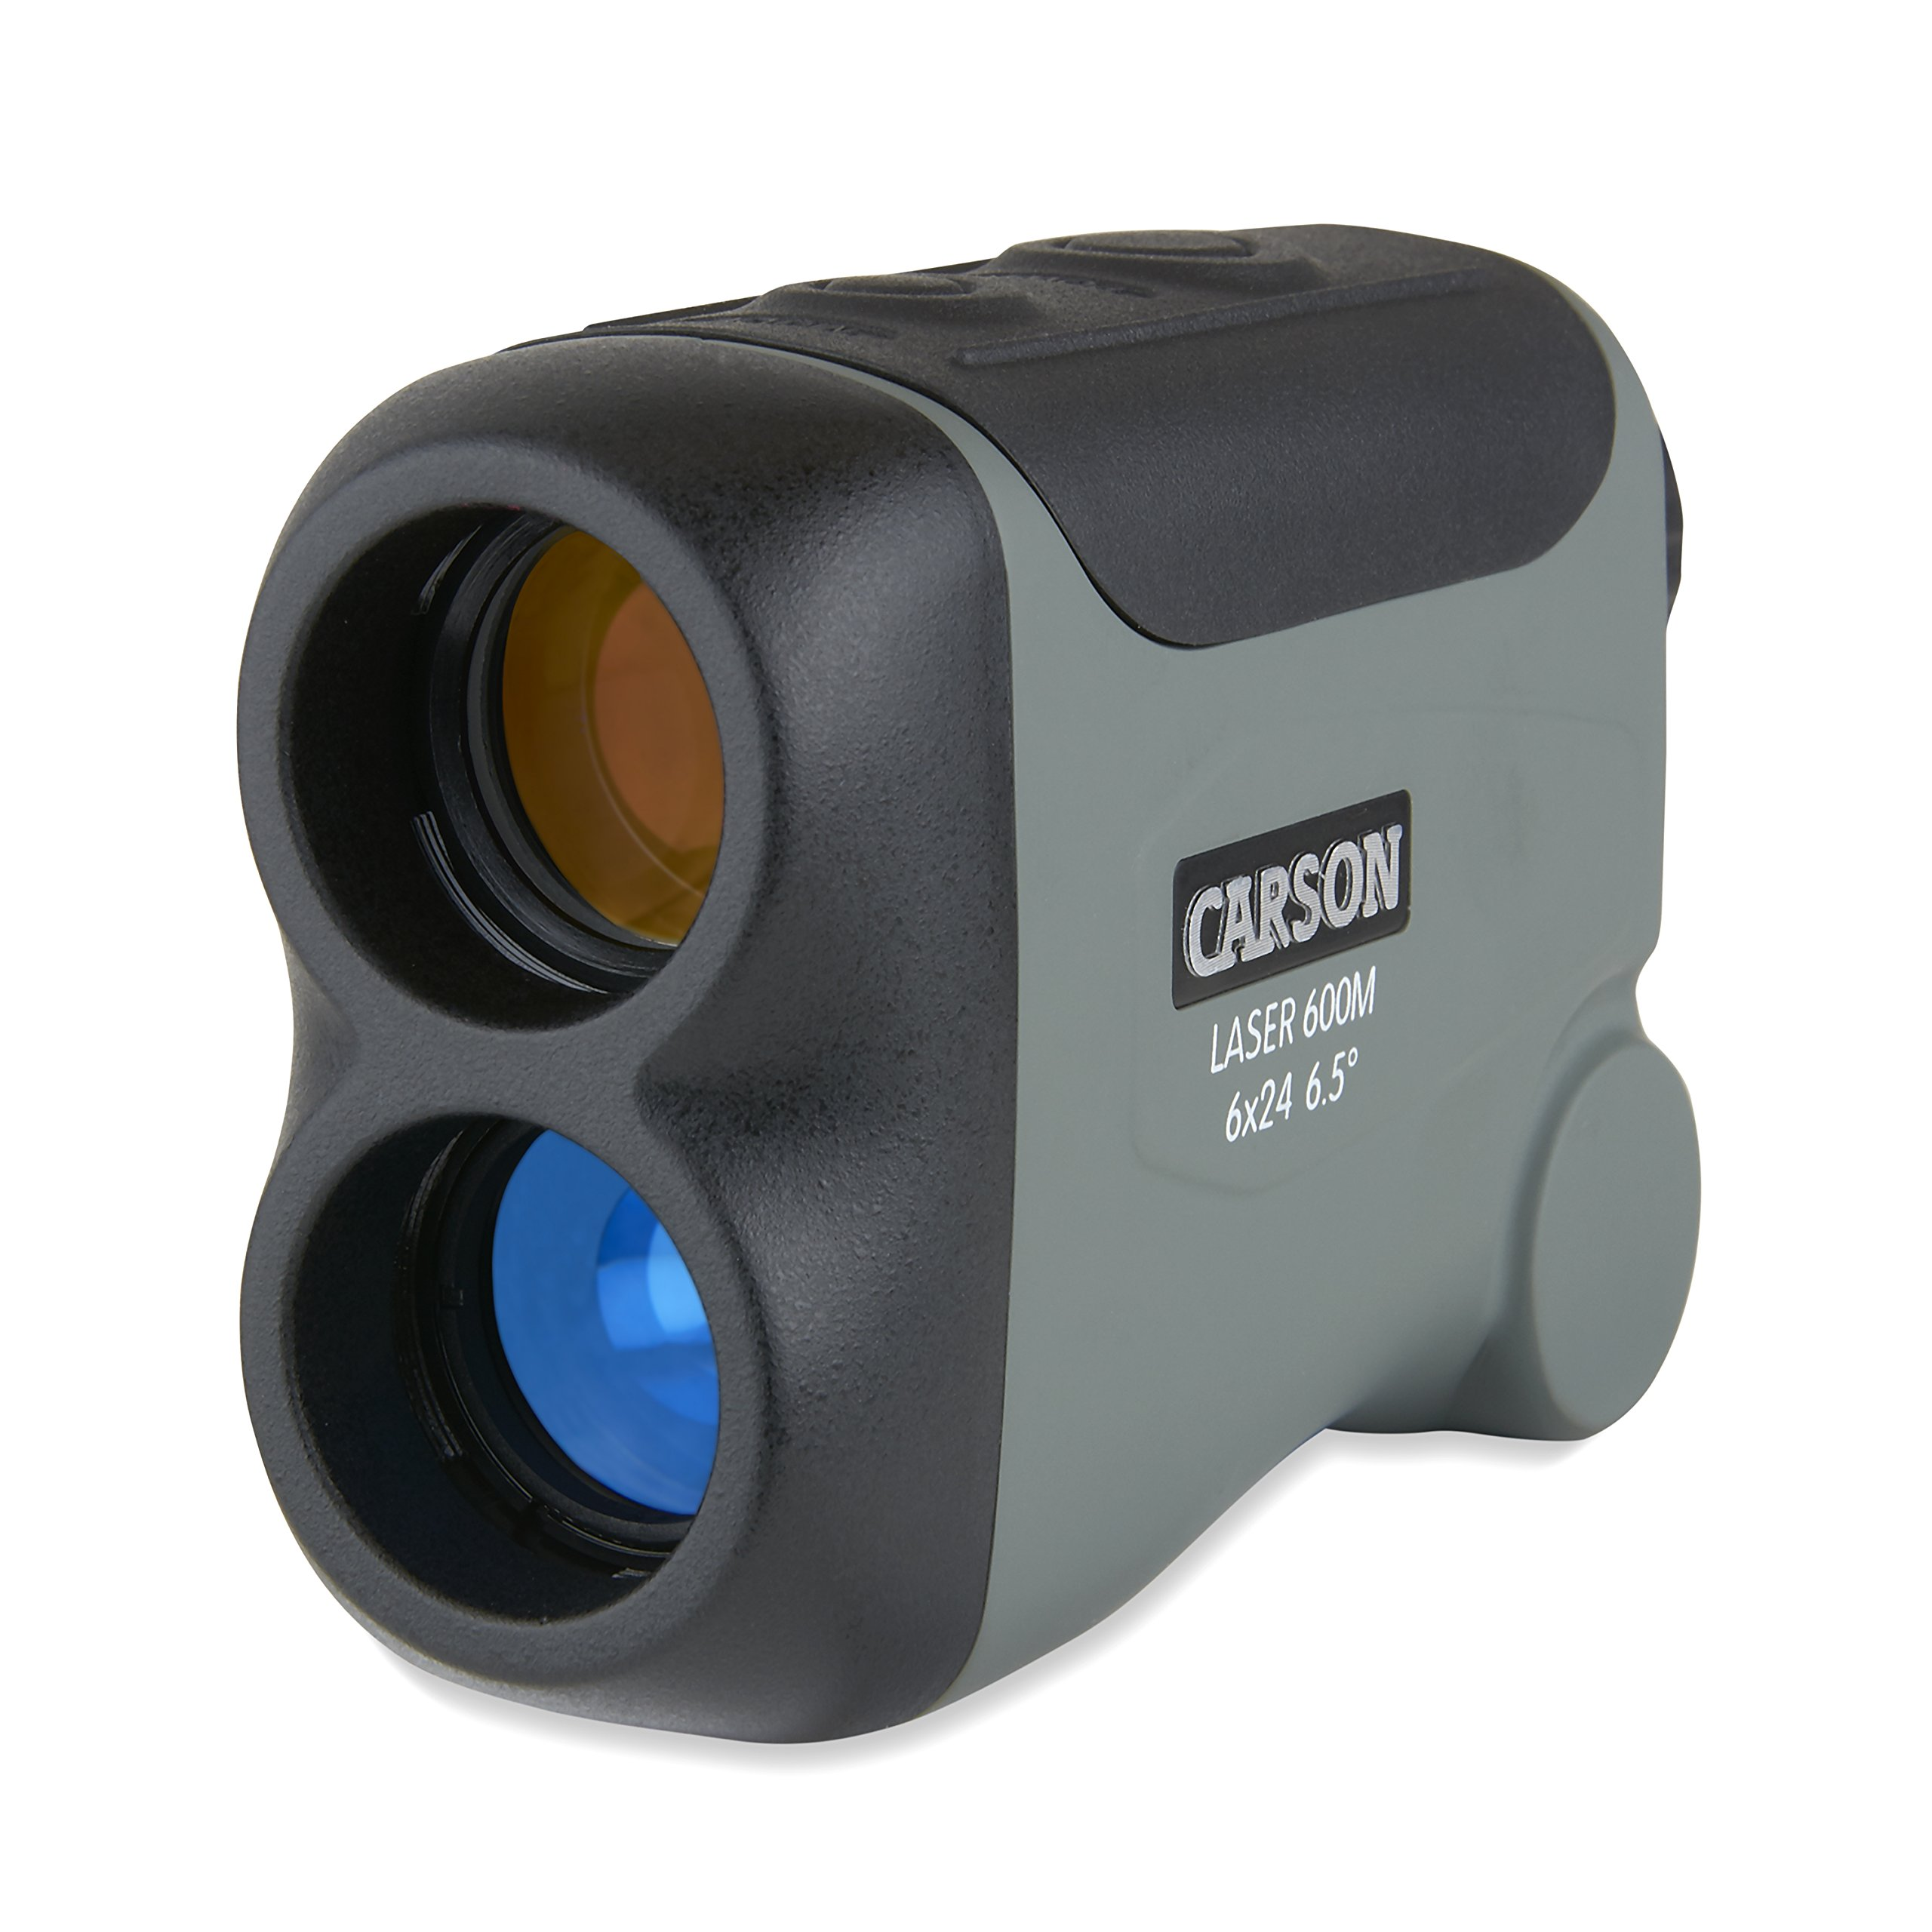 Carson Litewave 650 Yard Laser Rangefinder for Hunting, Golf, Engineering Surveys, Construction, Racing, Archery and More (RF-650)